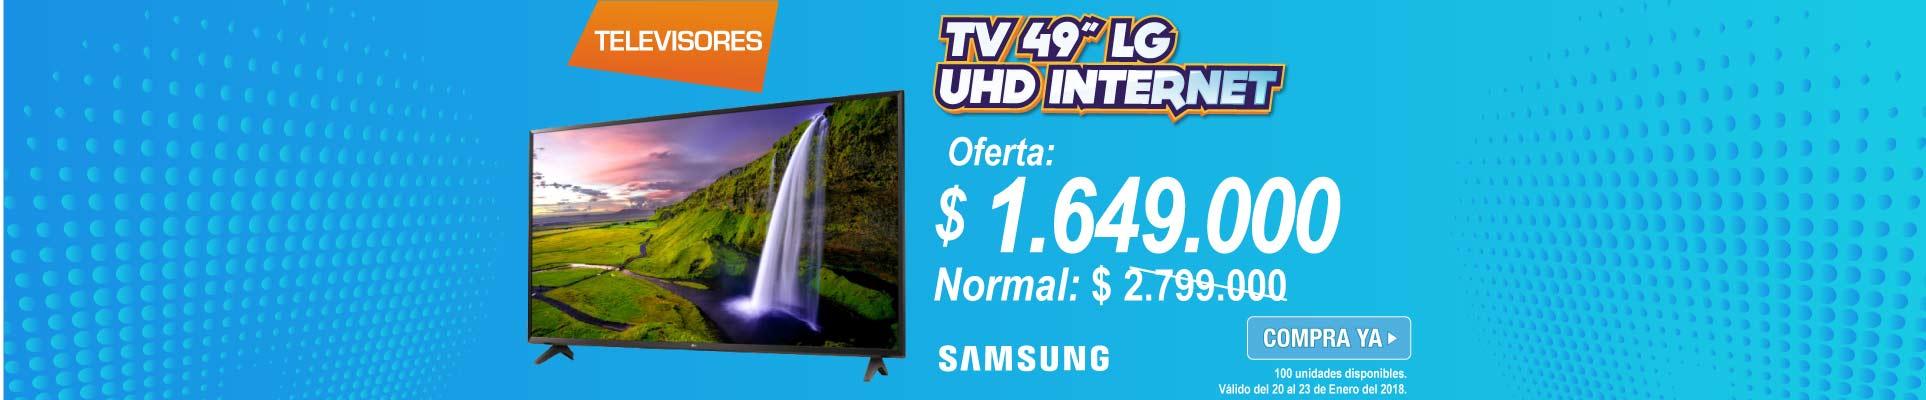 PPAL ALKP-2-TV-Tv49 123cm LG 49UJ620T UHD Internet-prod-enero20-23